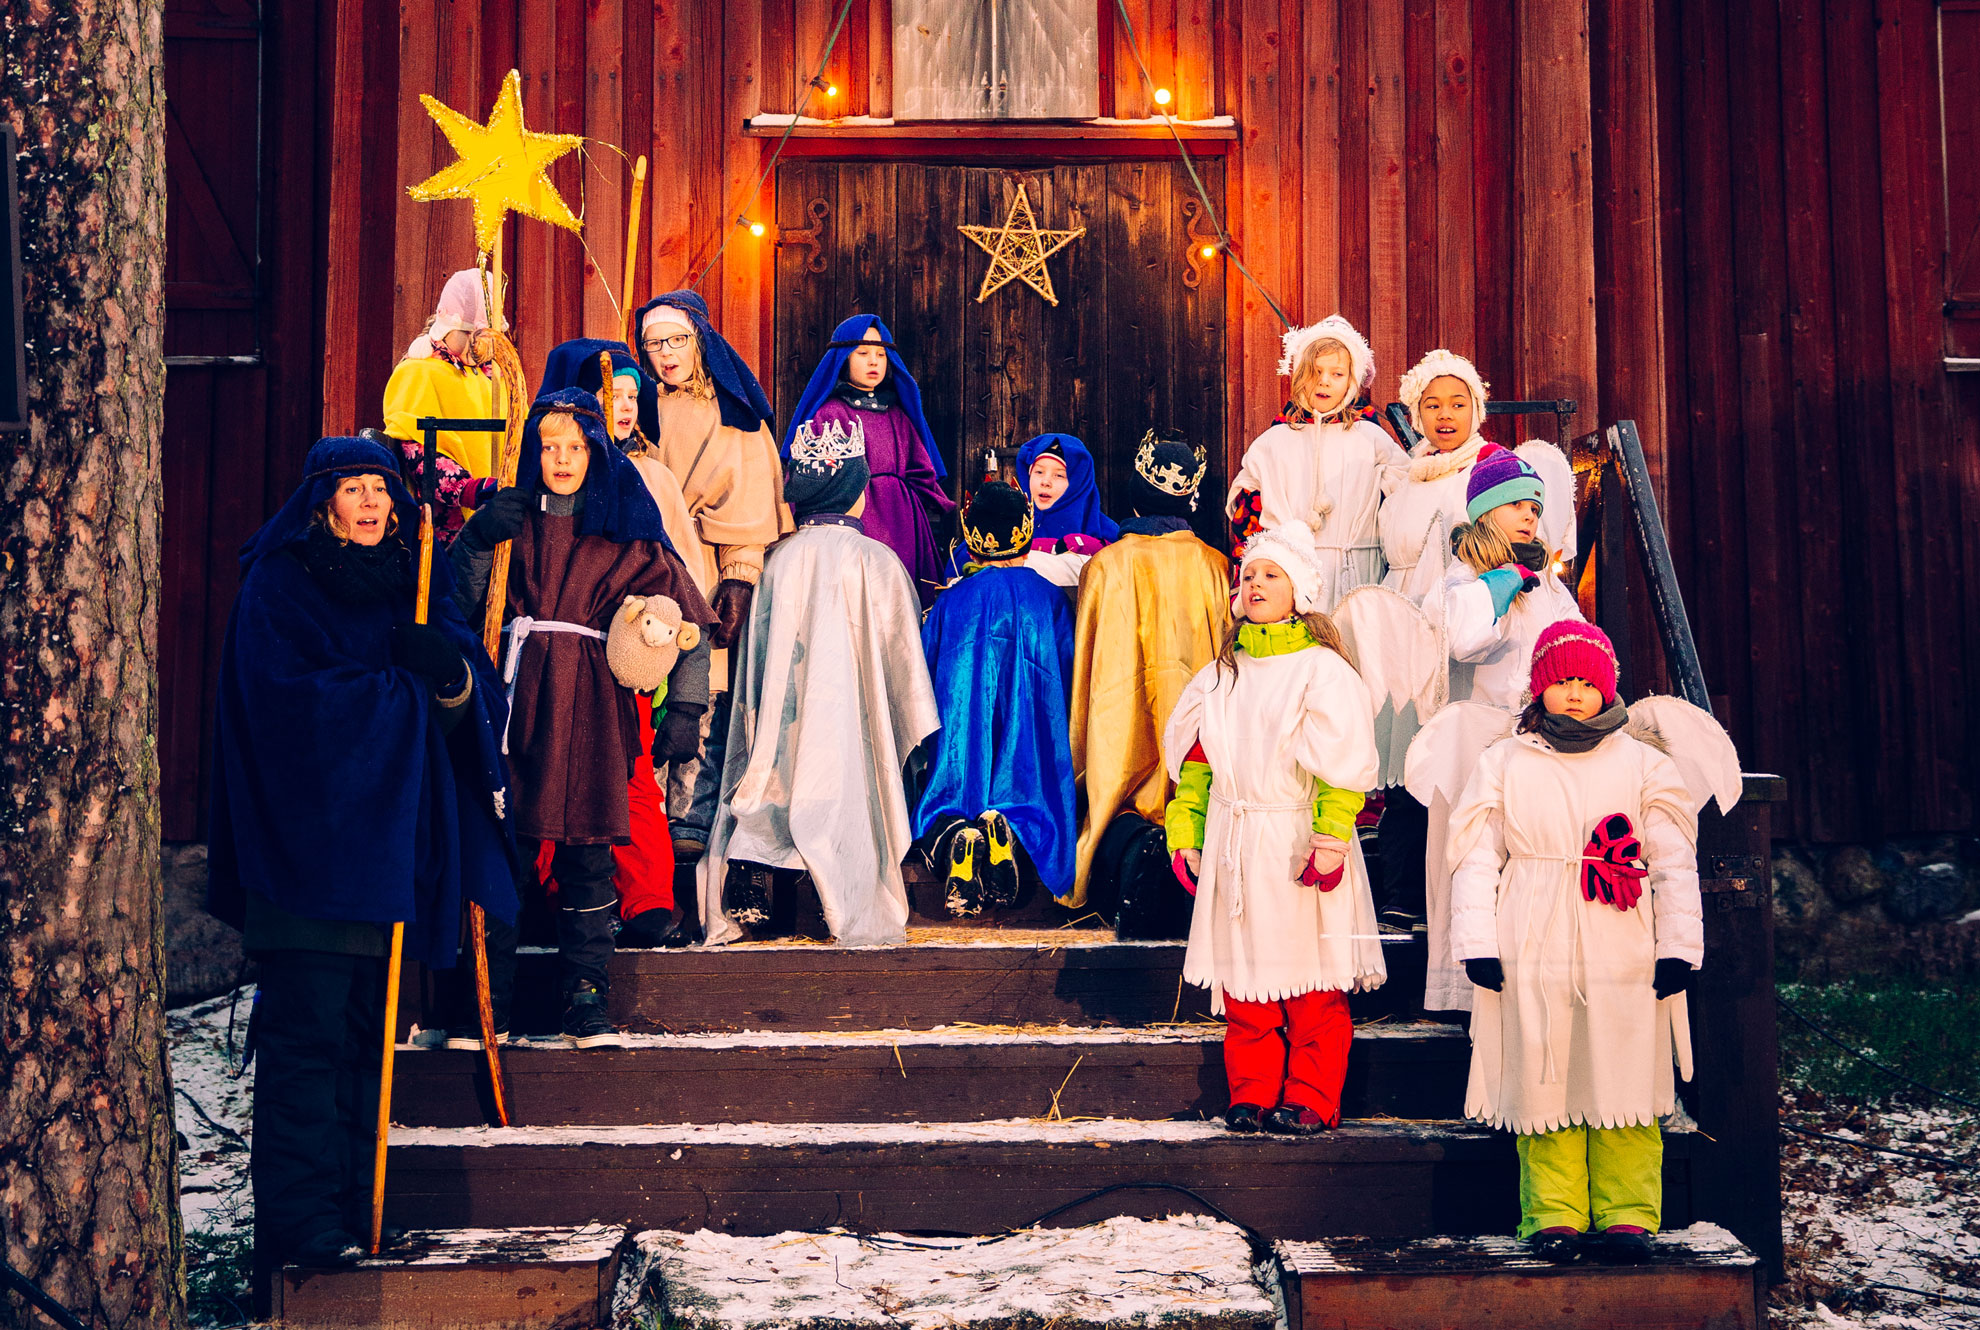 seurasaaren joulu 2018 Seurasaari Christmas Path 2018 | My Helsinki seurasaaren joulu 2018